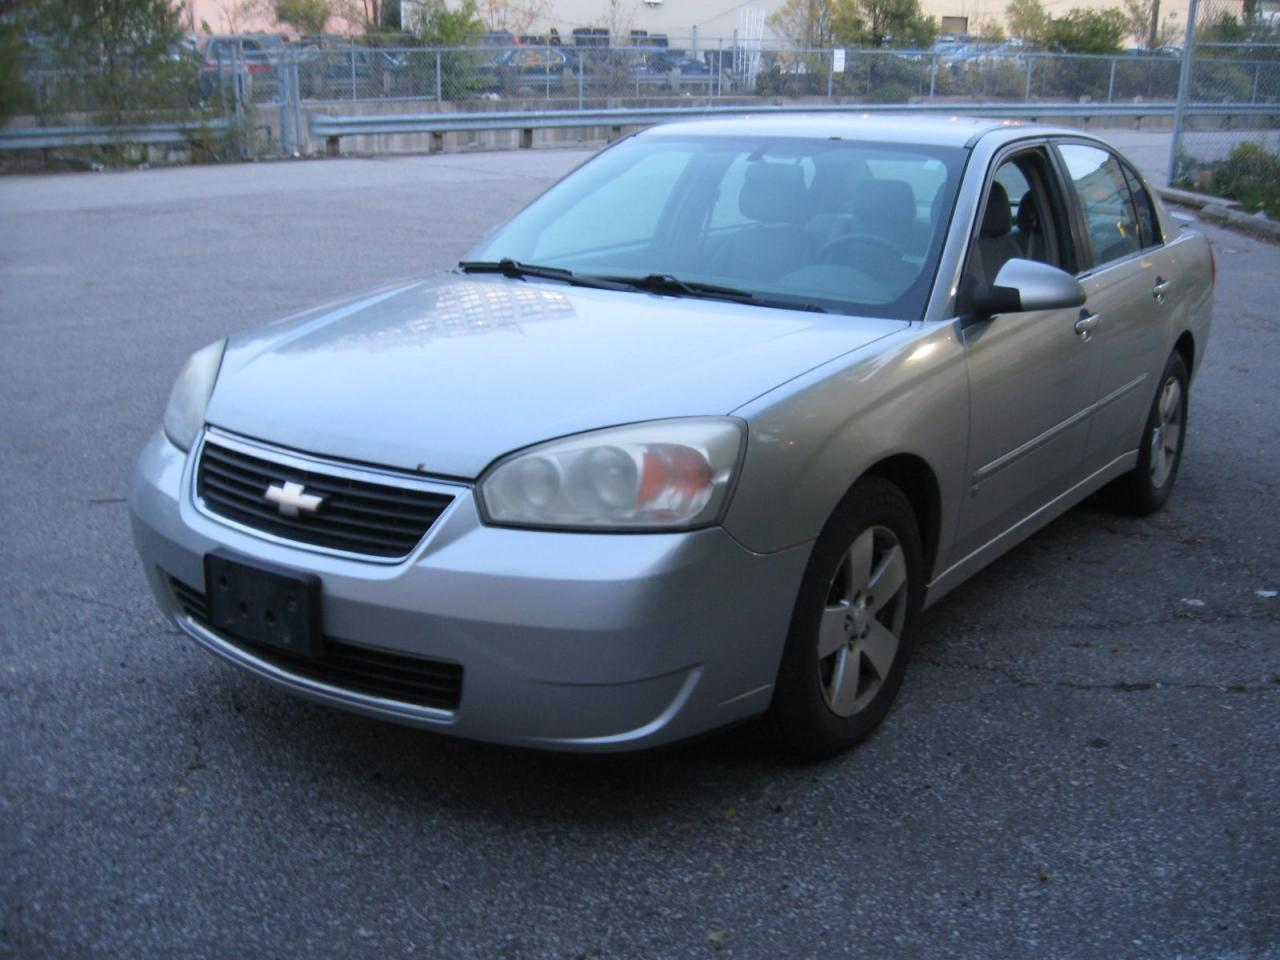 Photo of Silver 2006 Chevrolet Malibu